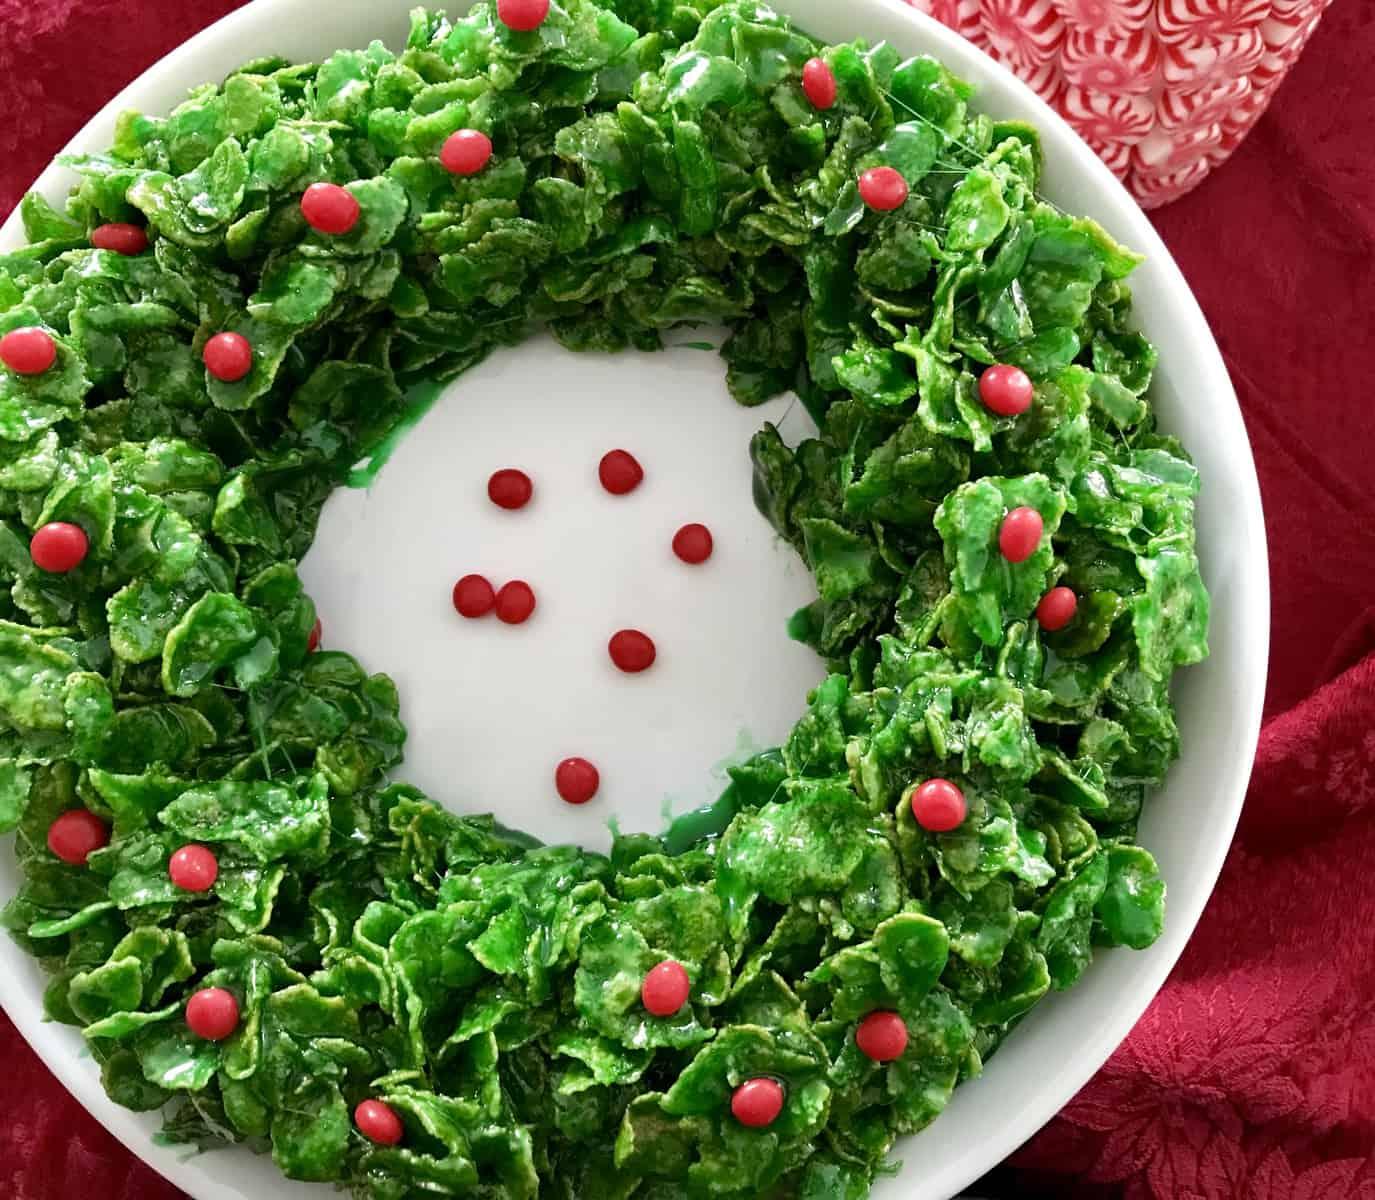 Marshmallow Christmas Wreath